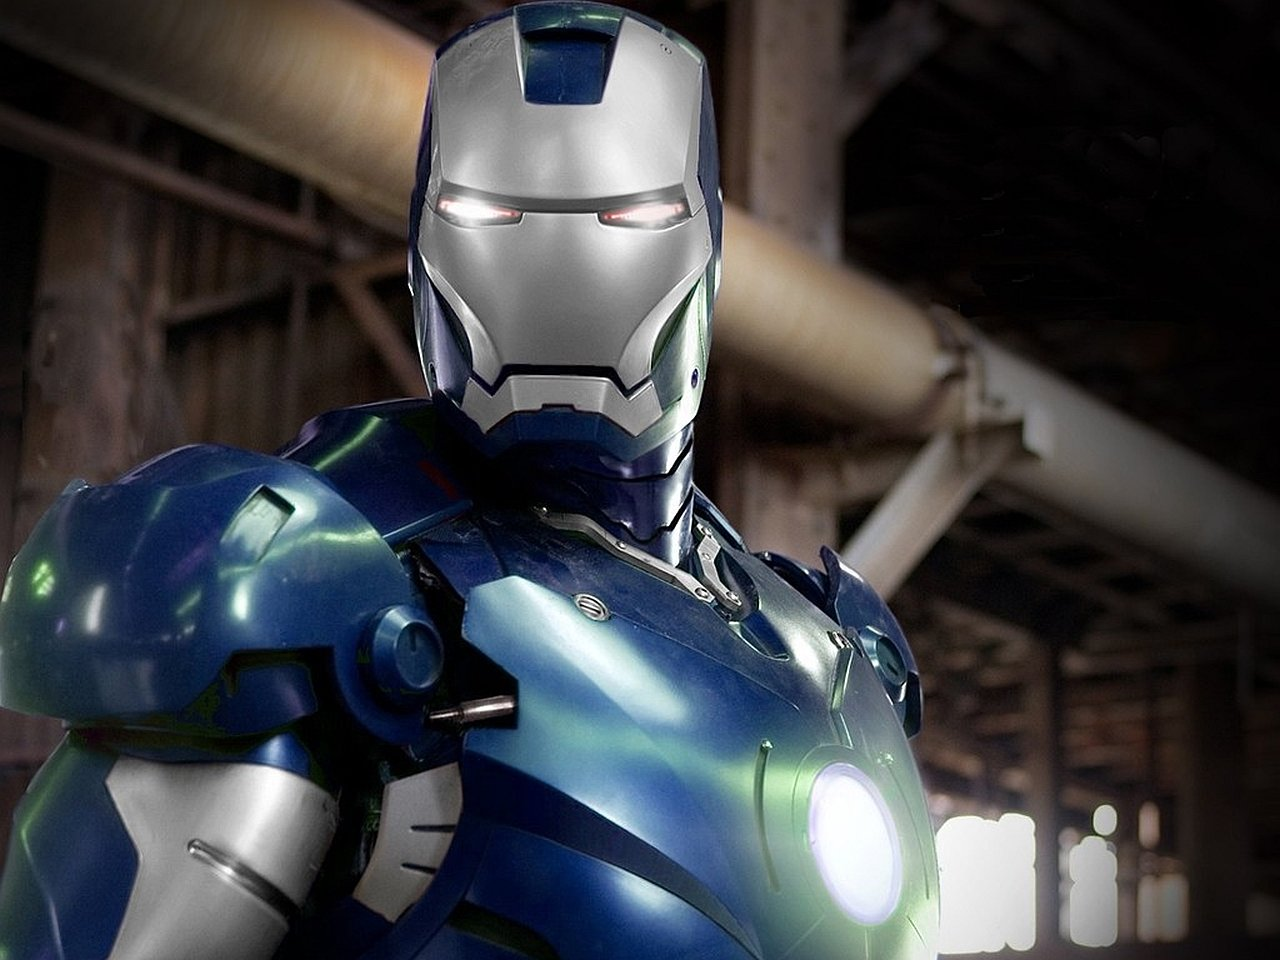 free download iron man 3 wallpaper id:400965 hd 1280x960 for desktop